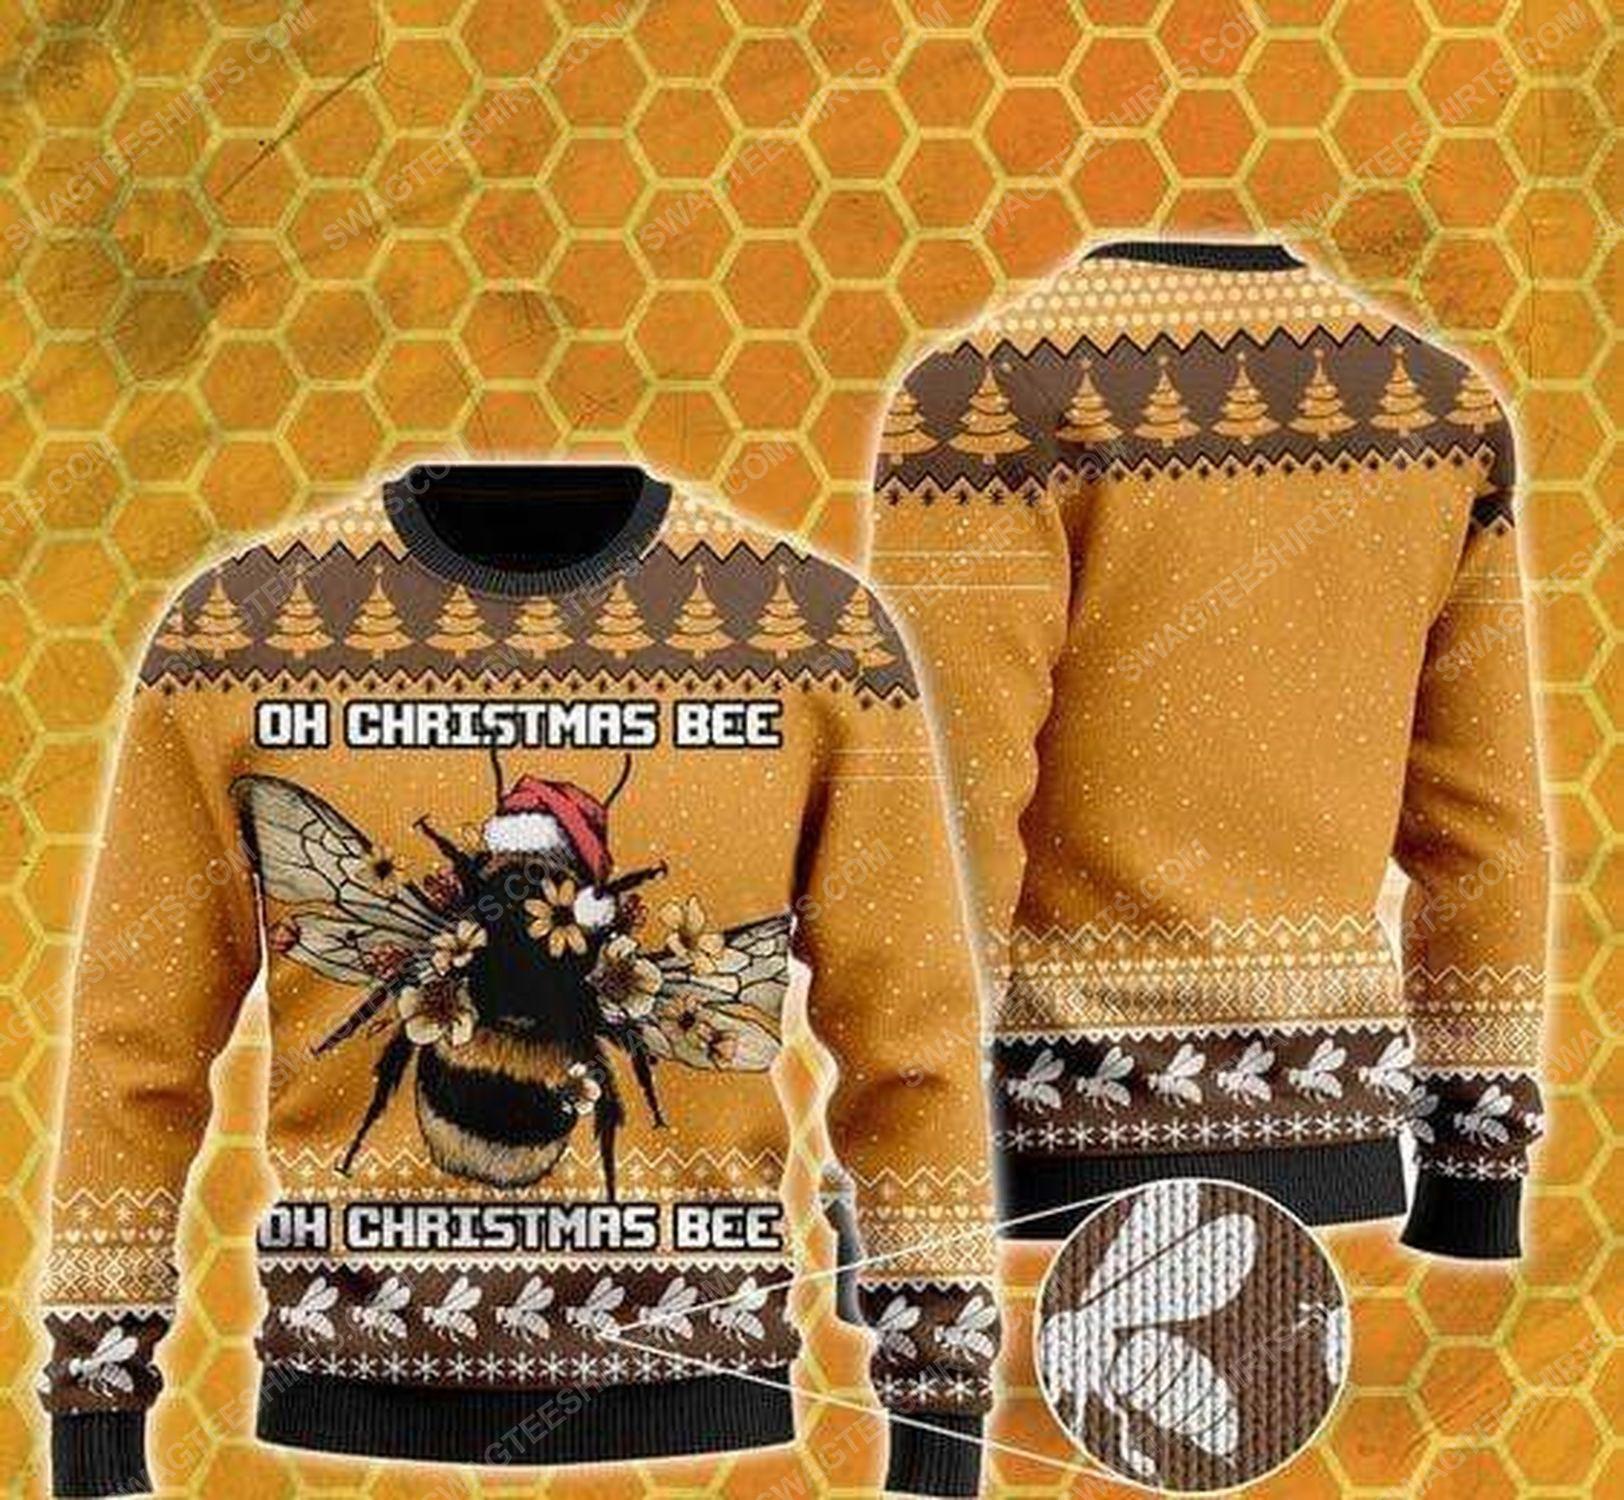 Oh christmas bee all over print ugly christmas sweater 1 - Copy (2)